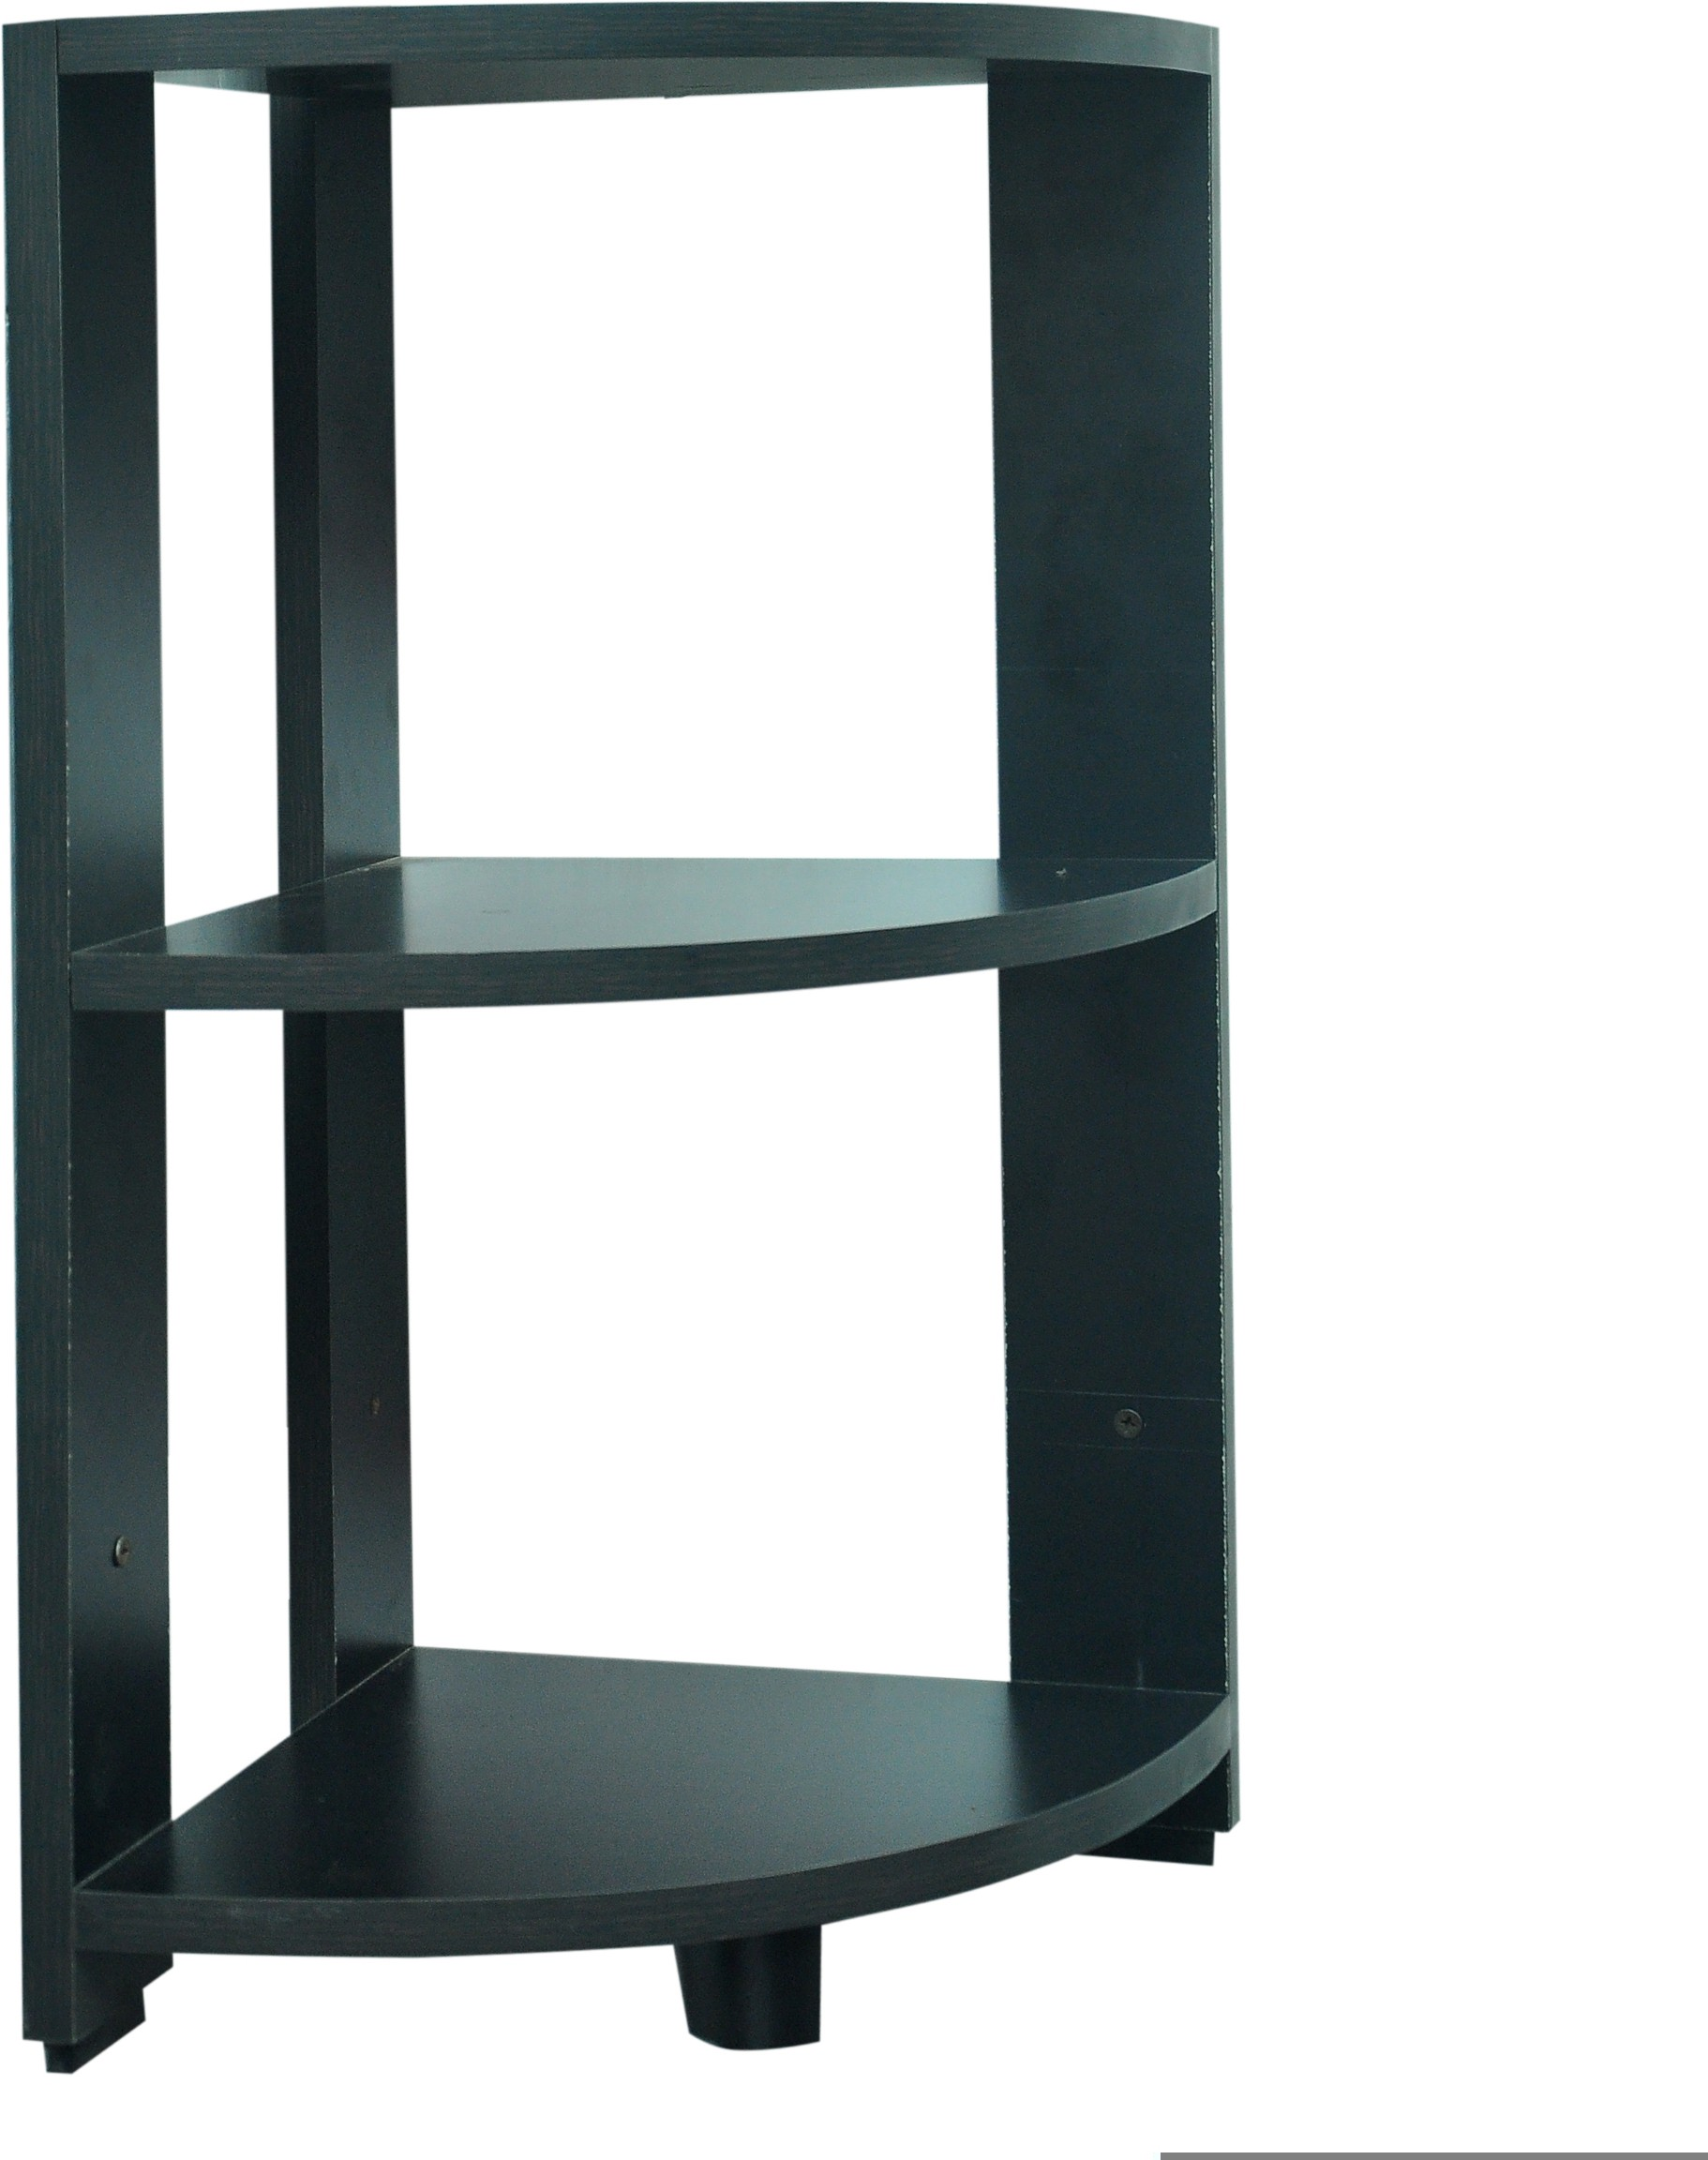 View SS Modulars Ssm Engineered Wood Corner Table(Finish Color - Black) Furniture (SS Modulars)